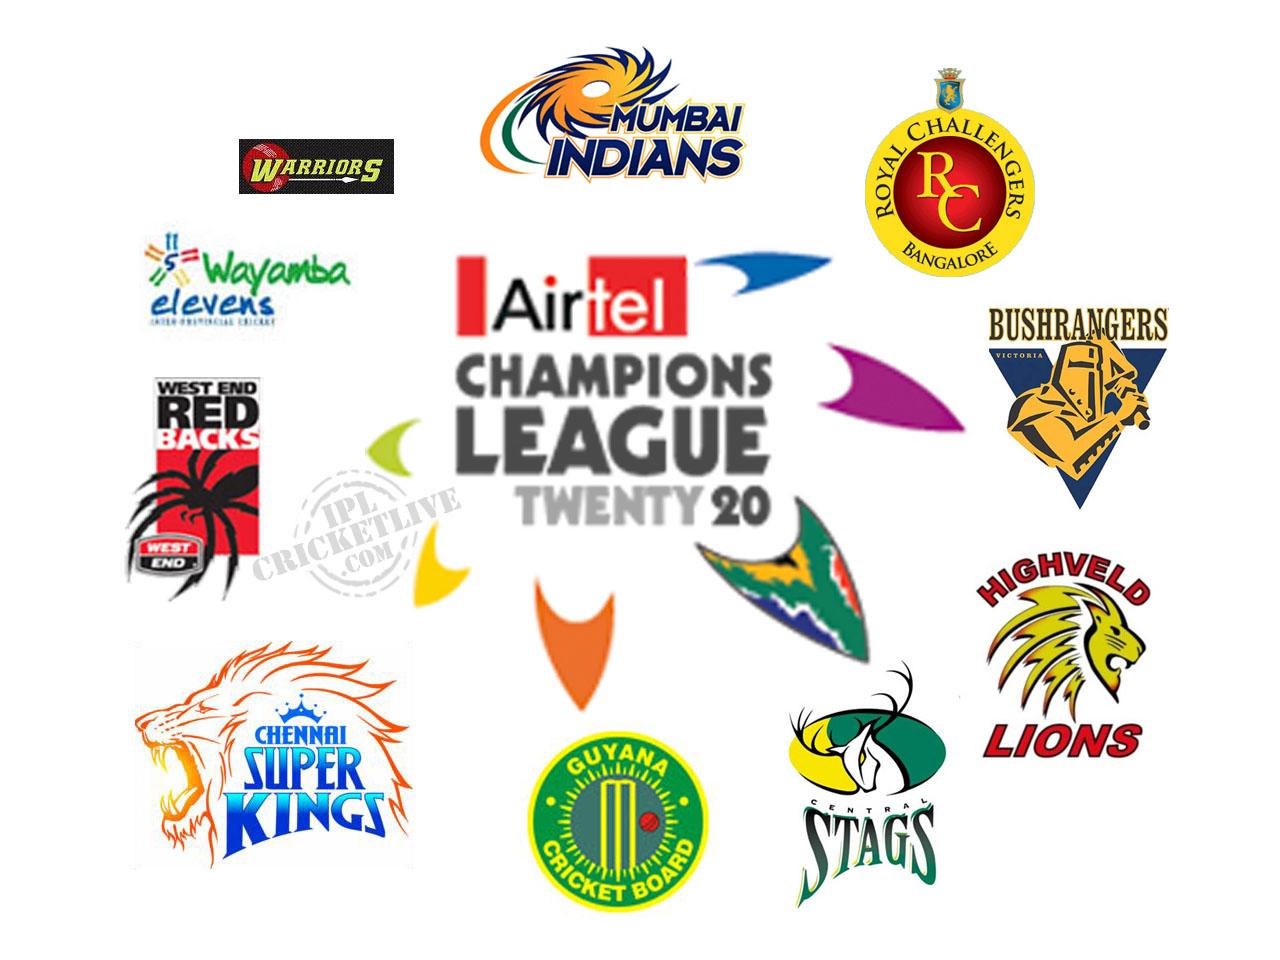 Guna Champions League T20 Cricket 2010